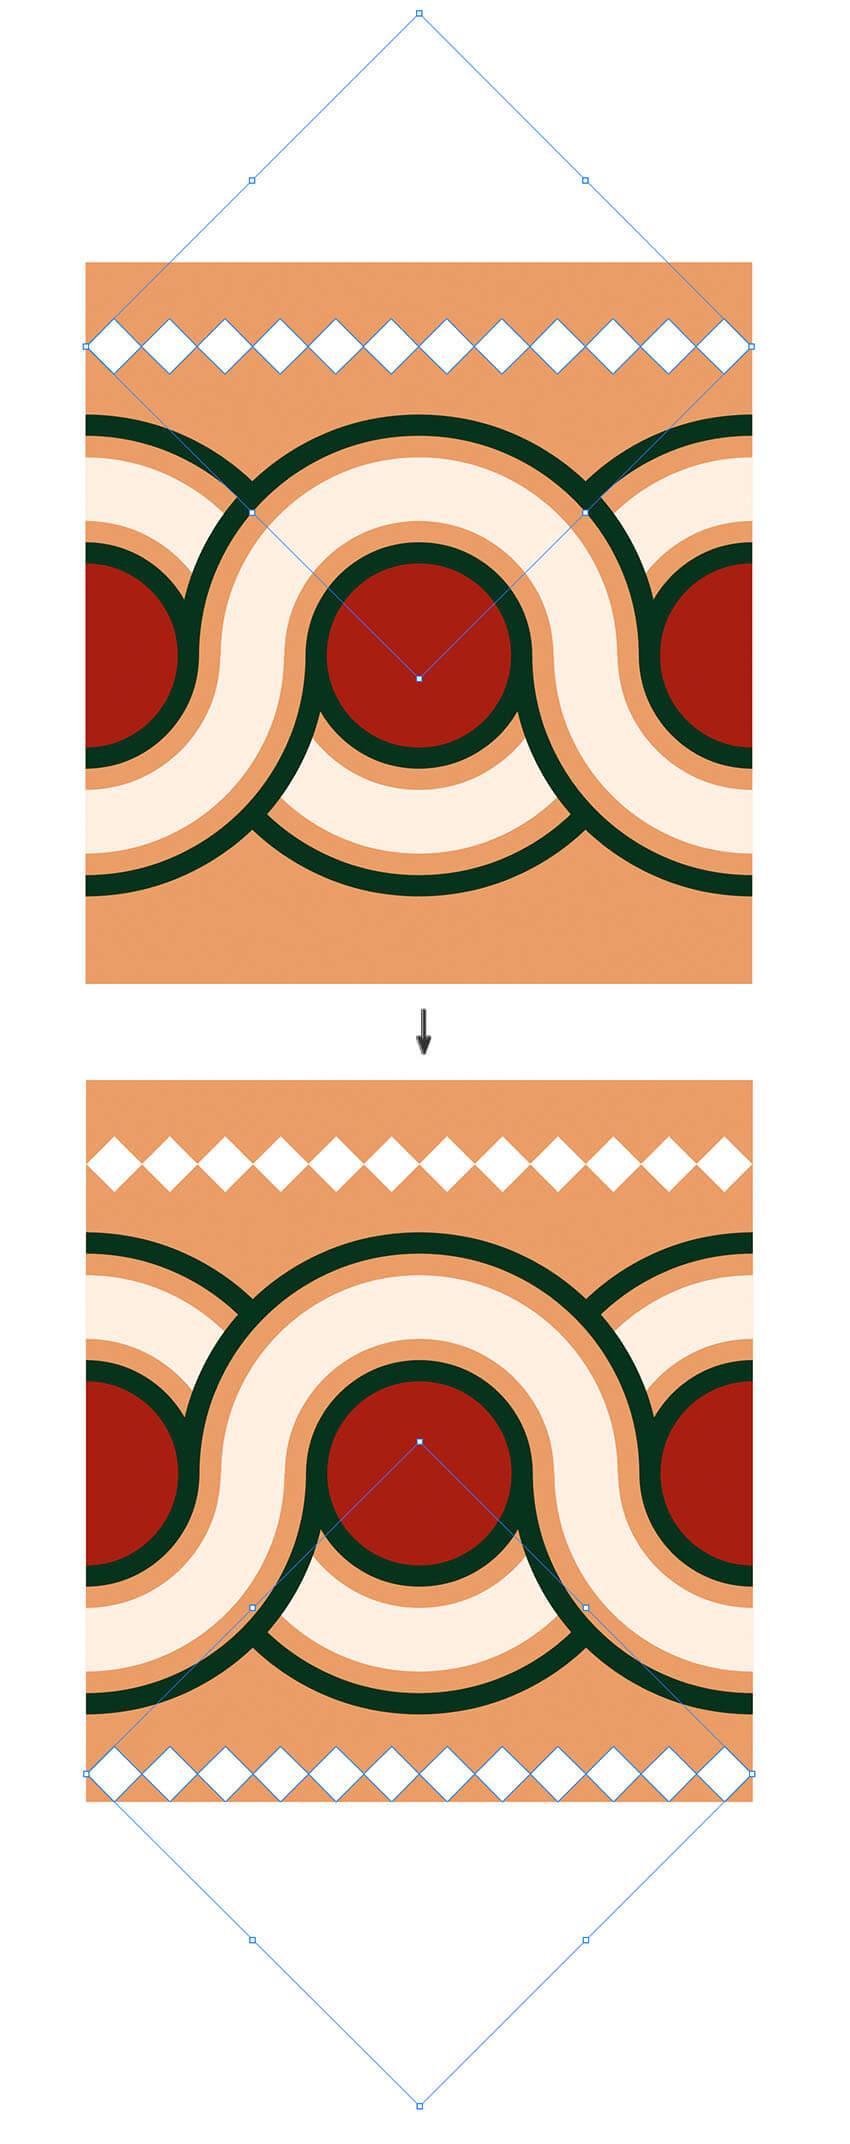 option shift drag diamond shape row horizontally and vertically